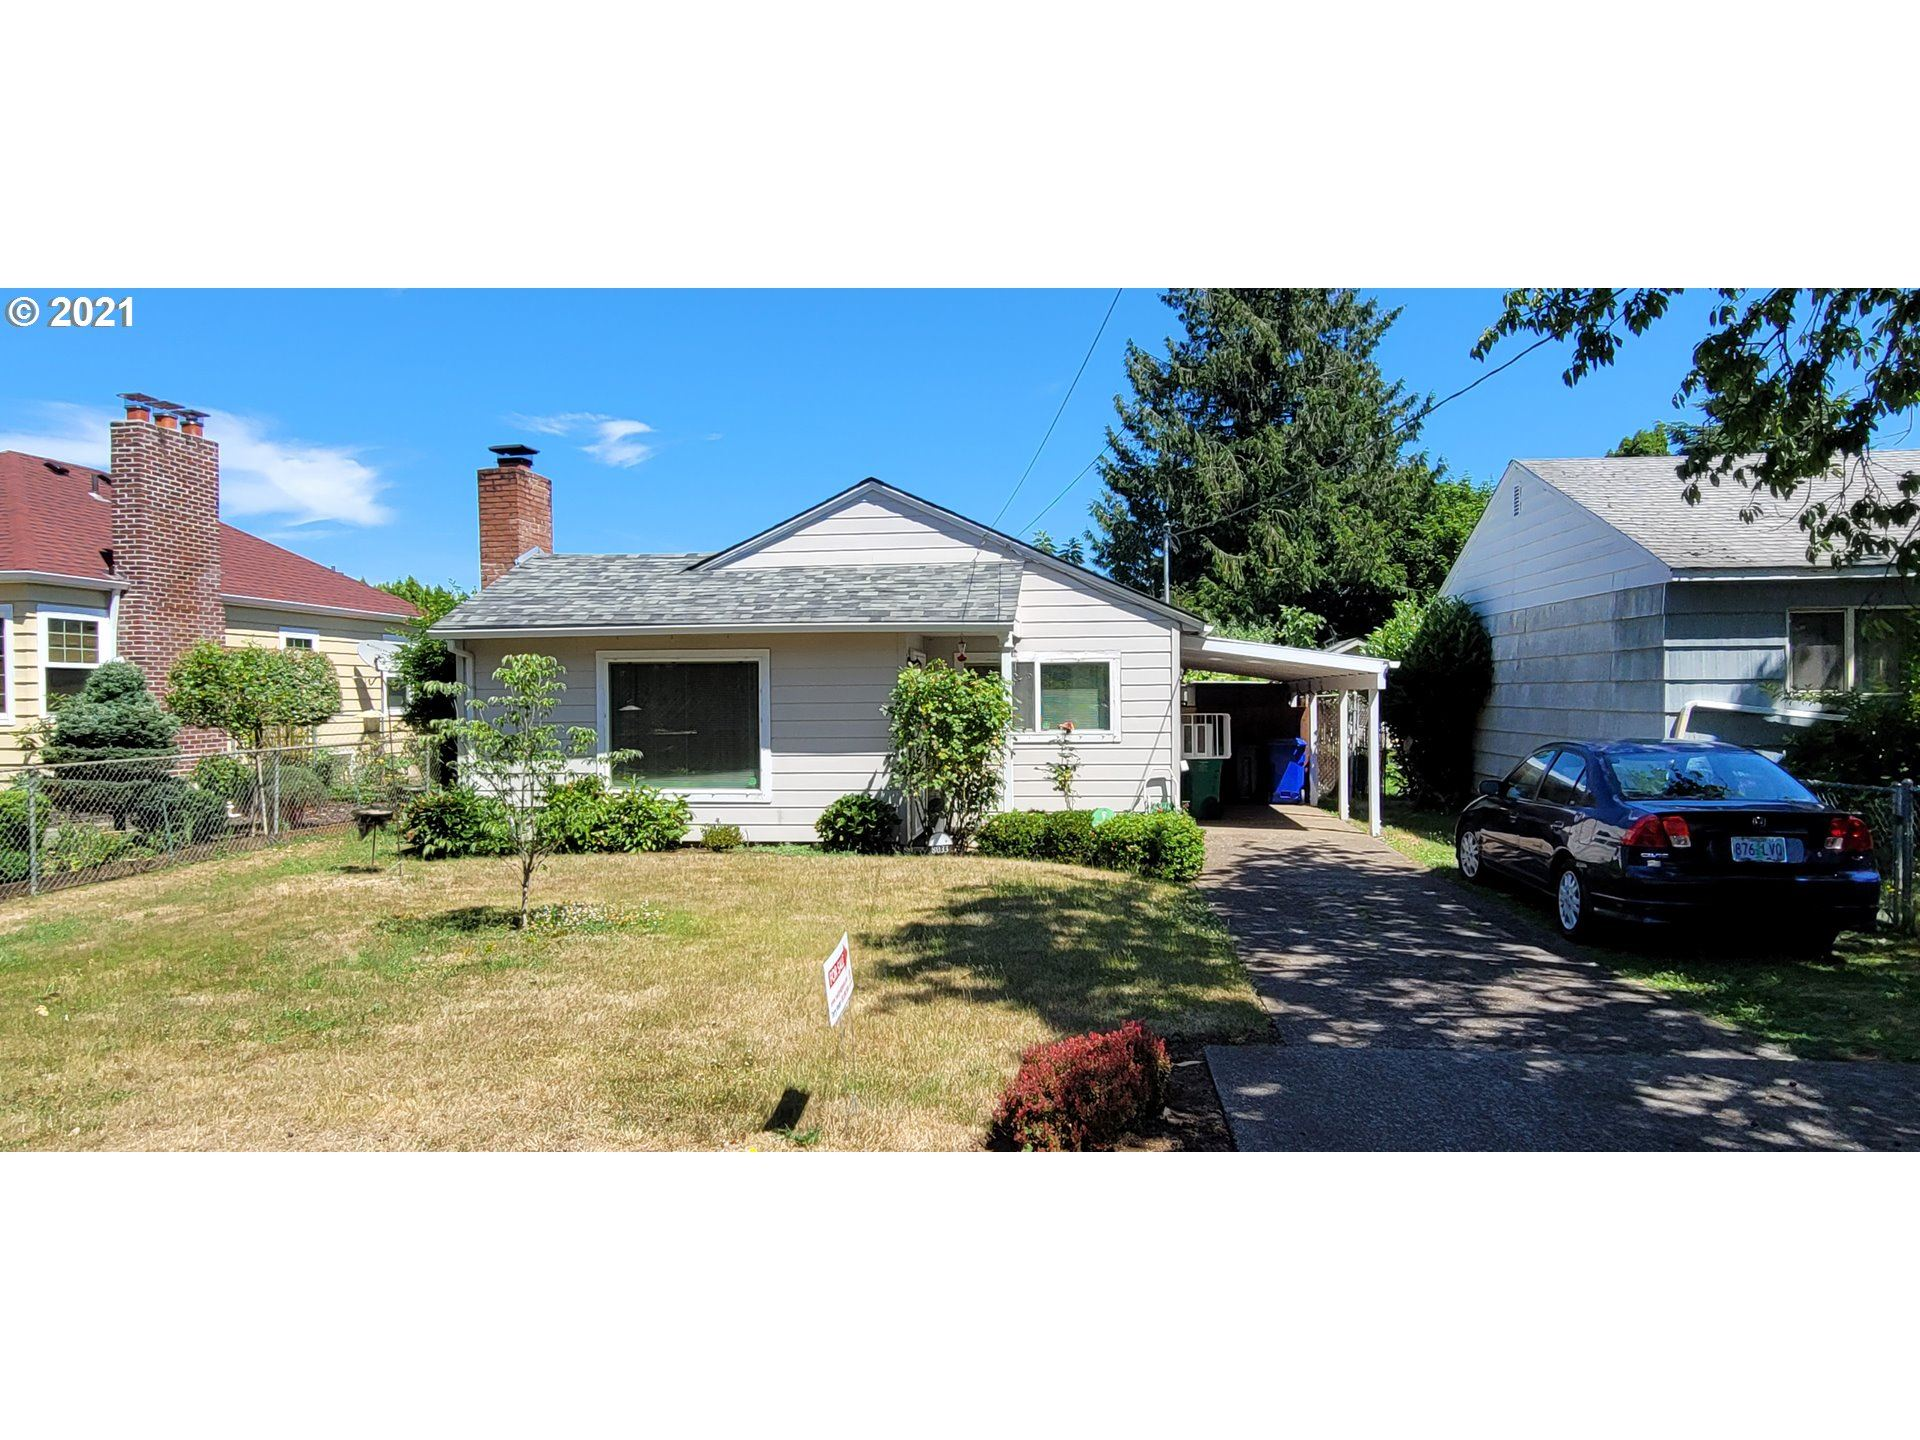 8033 SE BUSH ST, Portland, OR 97206 - MLS#: 21087238